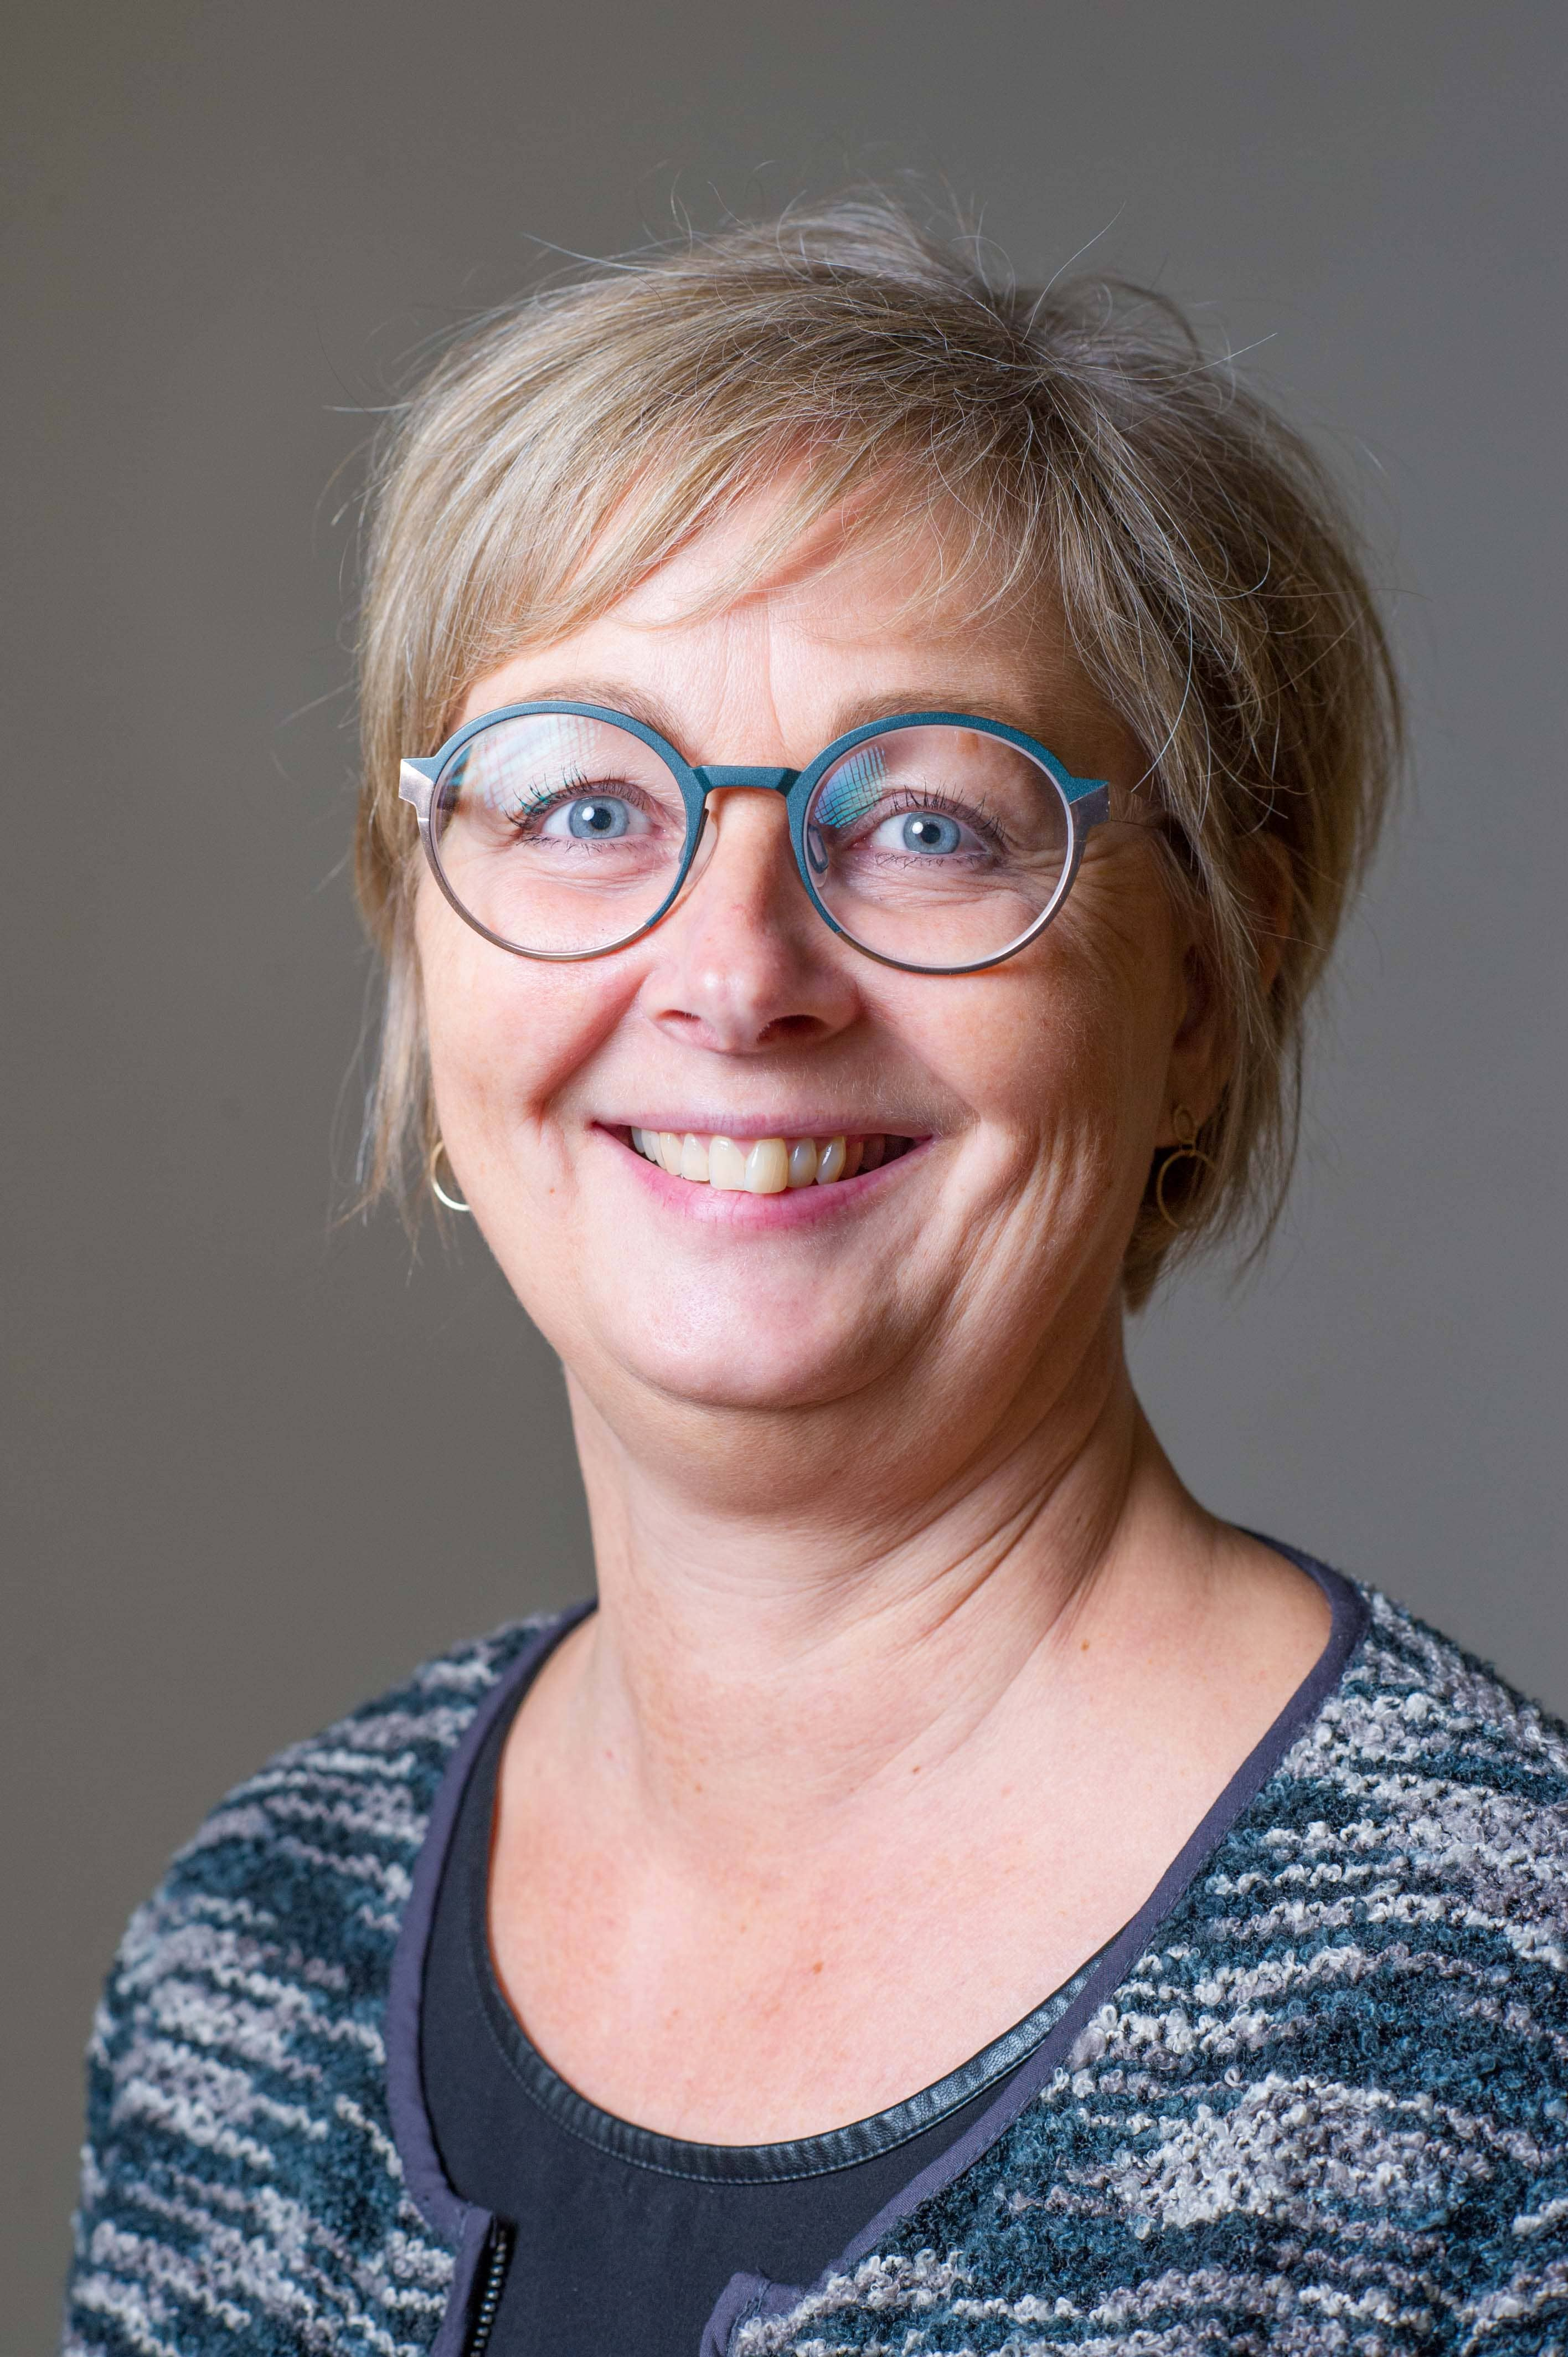 Lotte Lyngholm